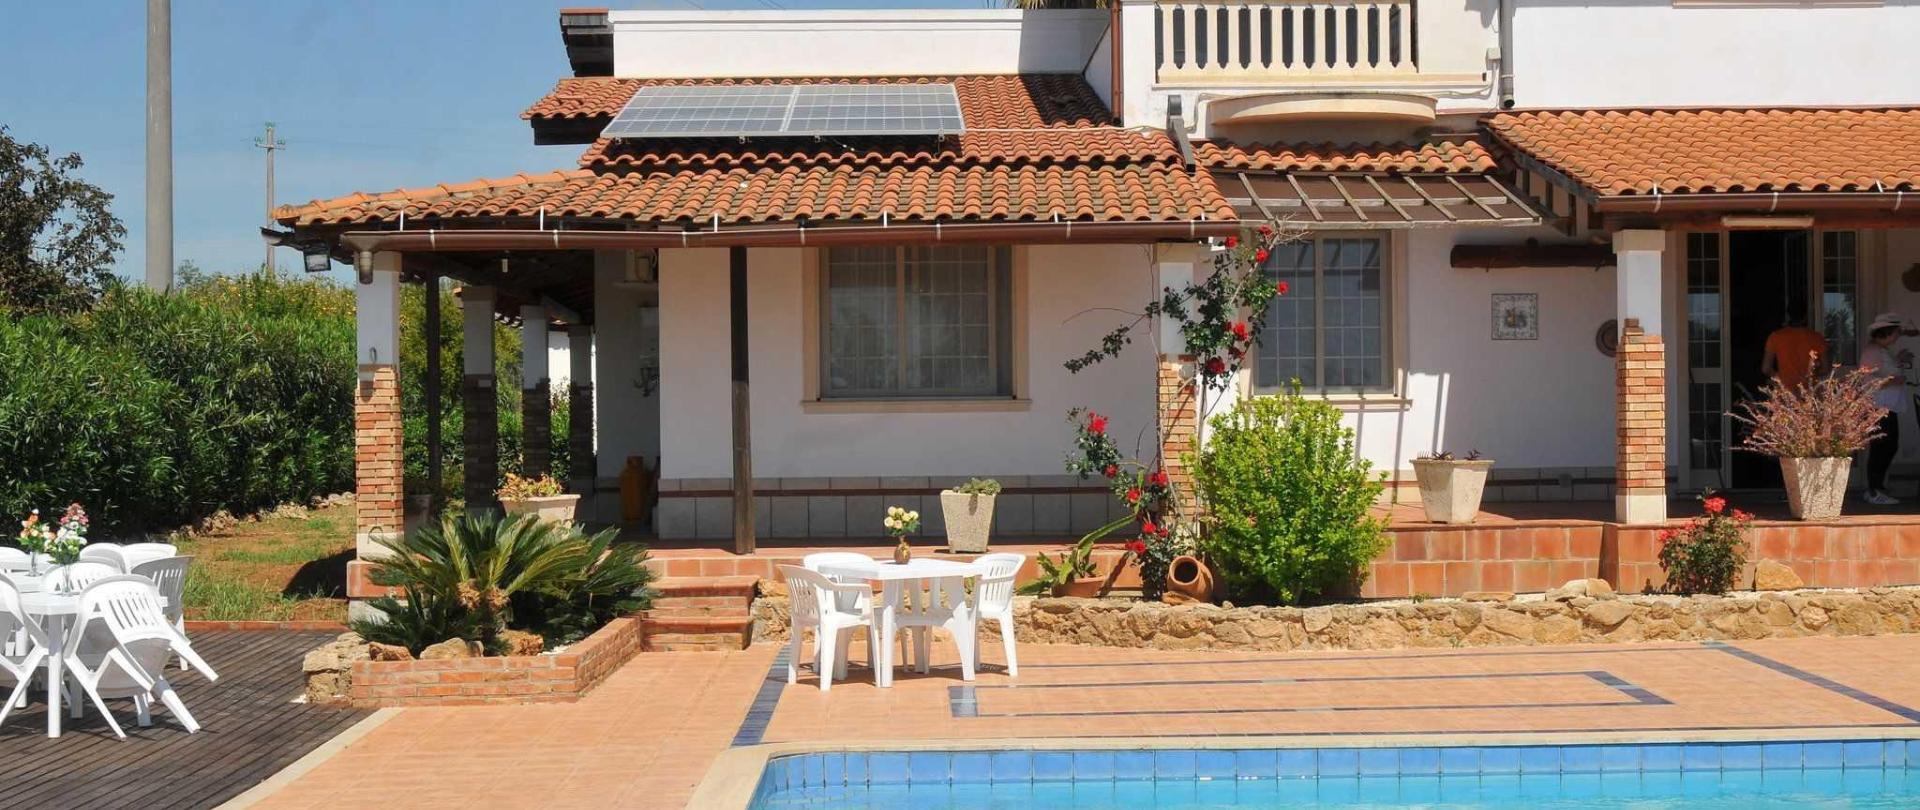 7_resort_noto_il_mandorleto_avola_villa_con_piscina_campagna_siciliana_13.JPG